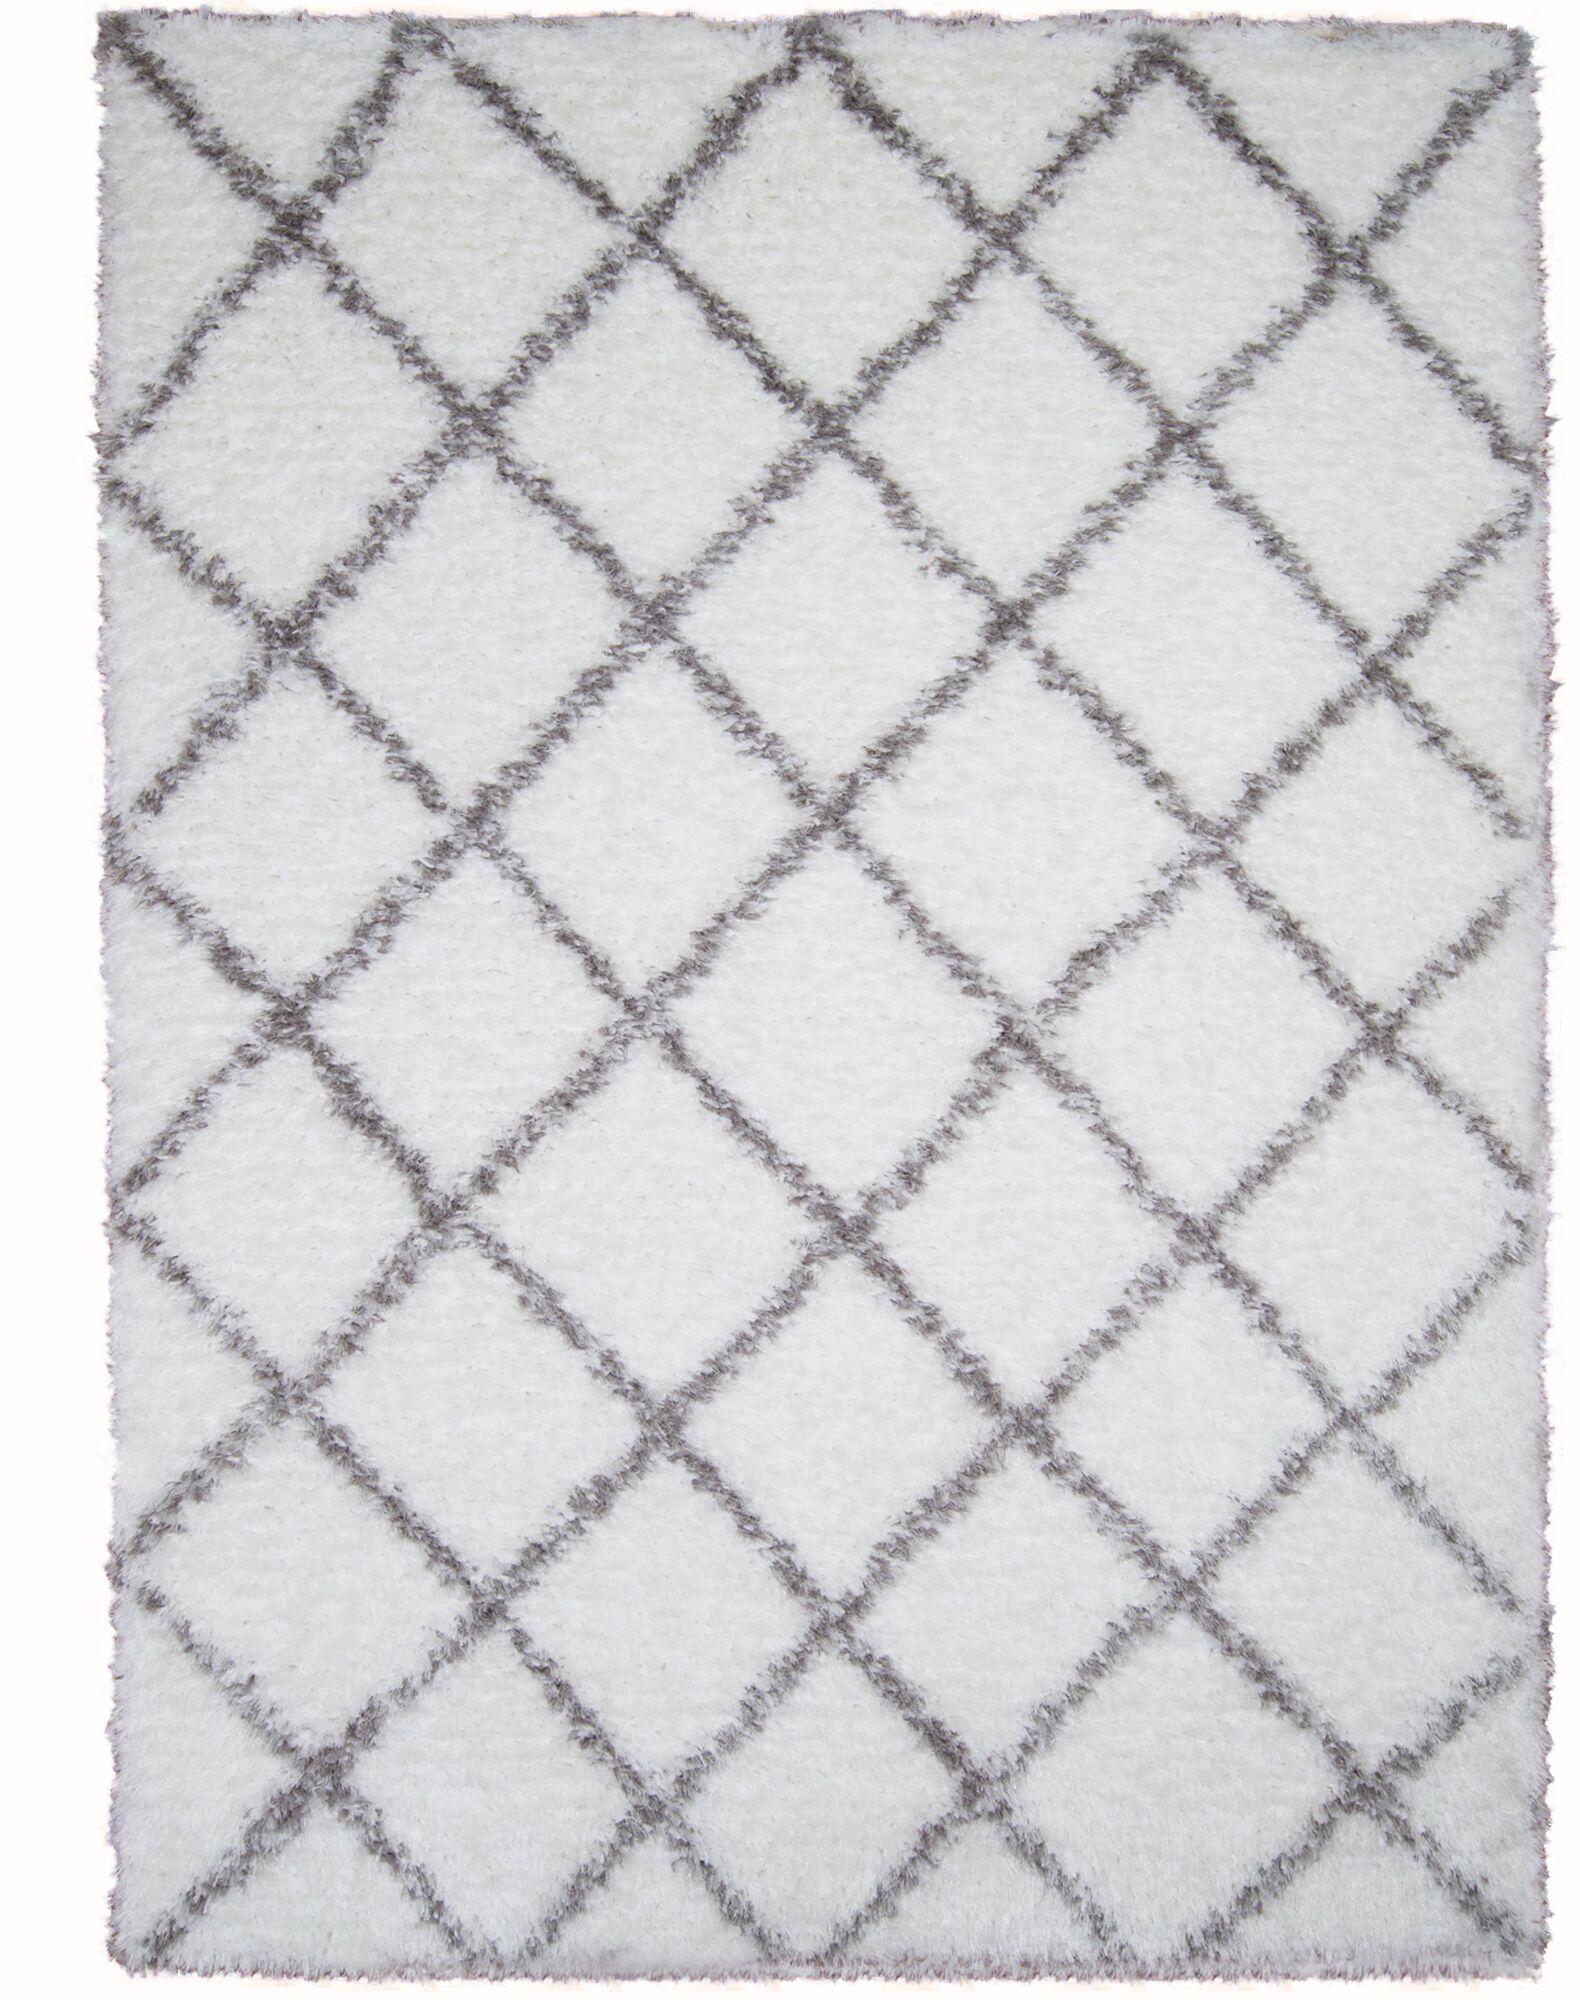 Abarca White Area Rug Rug Size: Rectangle 7'10